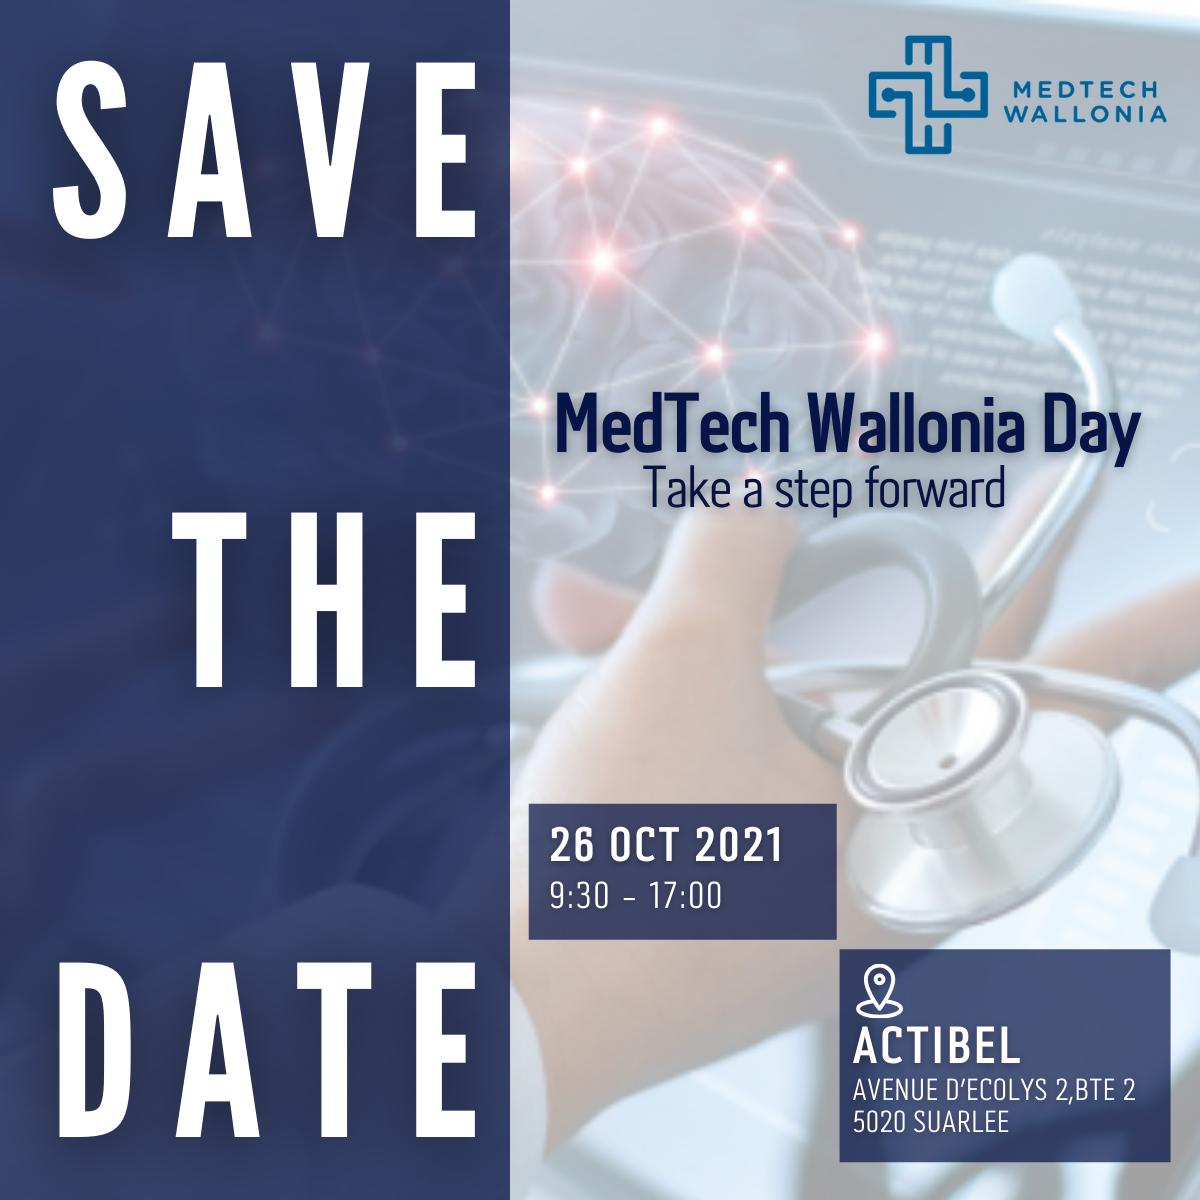 MedTech Wallonia Day 26 OCT 2021